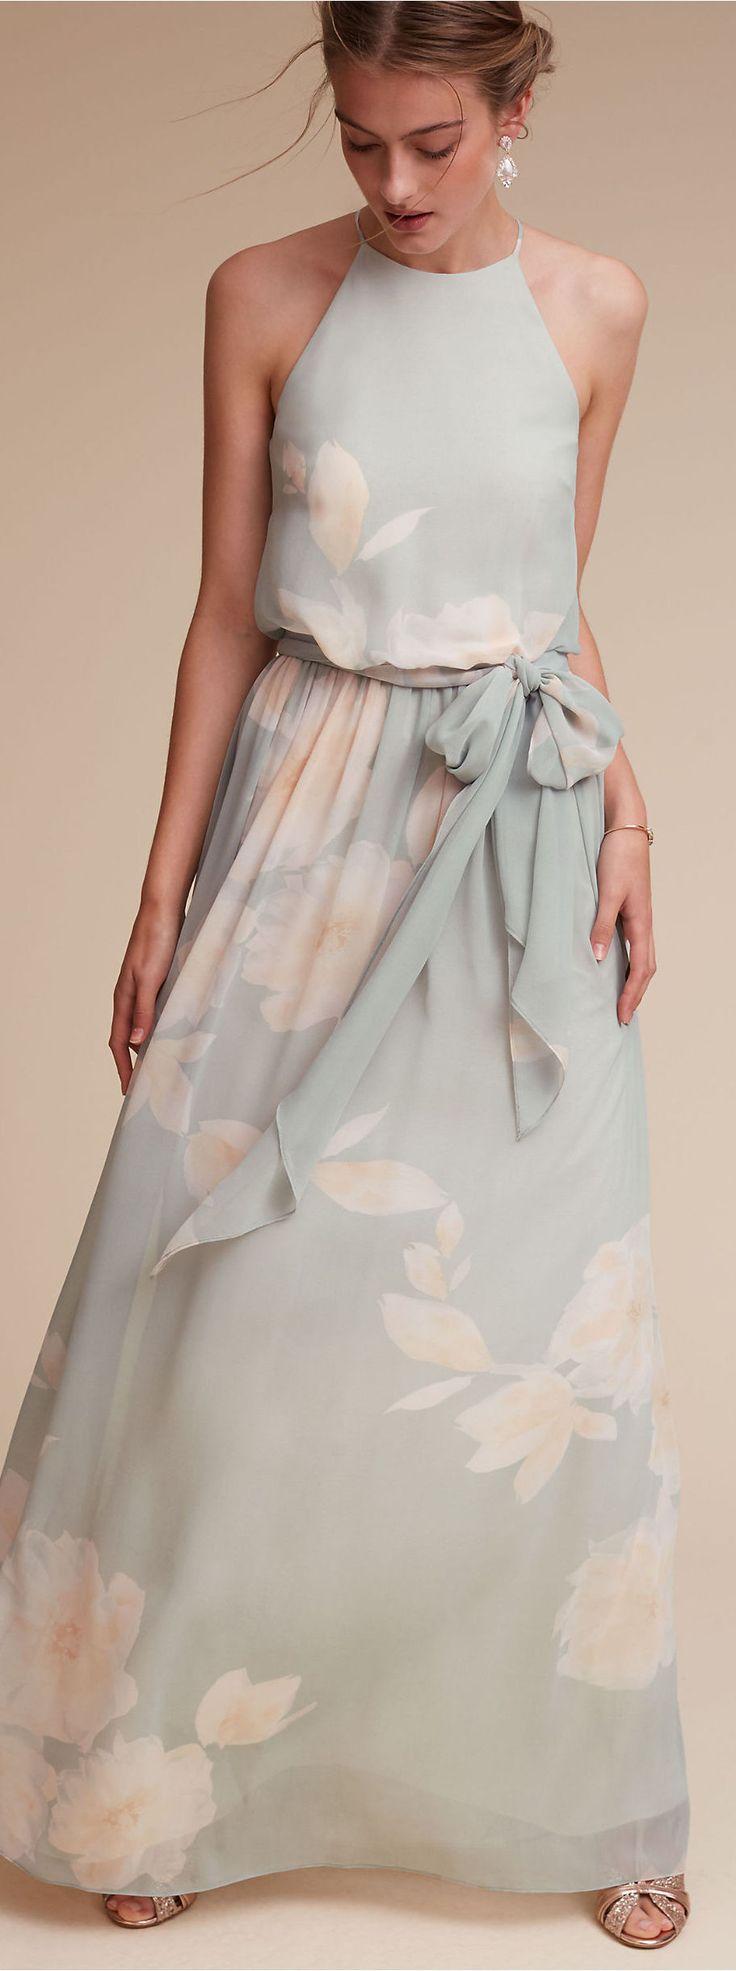 Pastel Floral Bridesmaid Dress   BHLDN